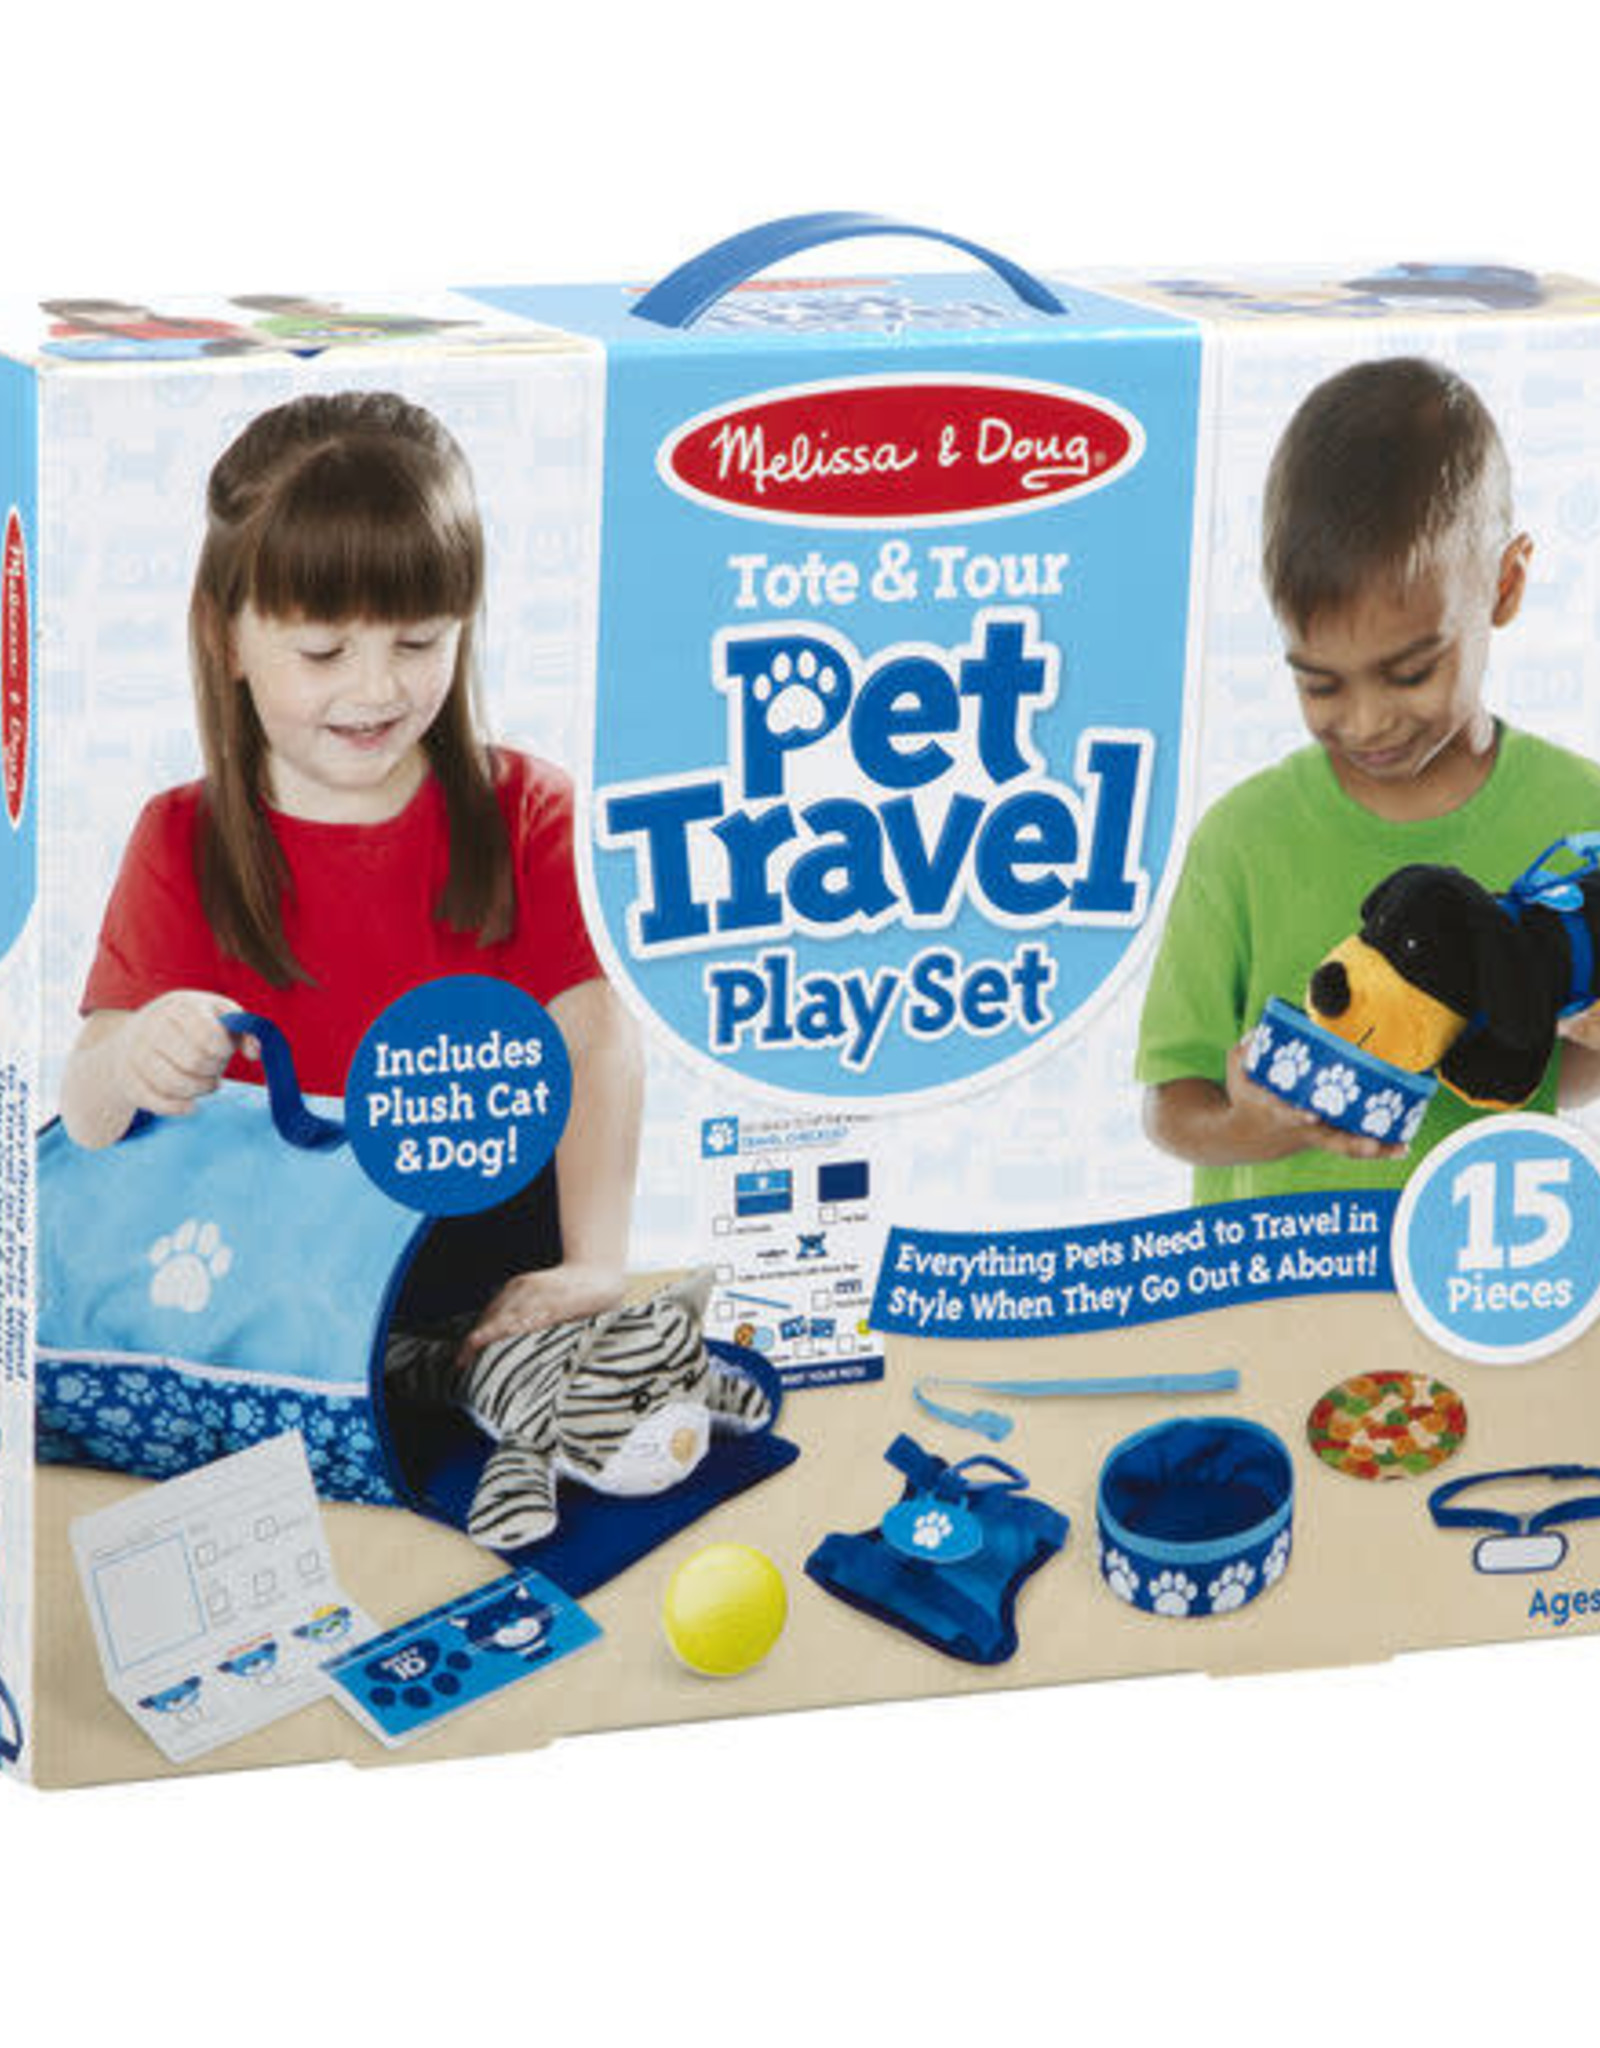 Melissa & Doug Tote and Tour Pet Travel Playset